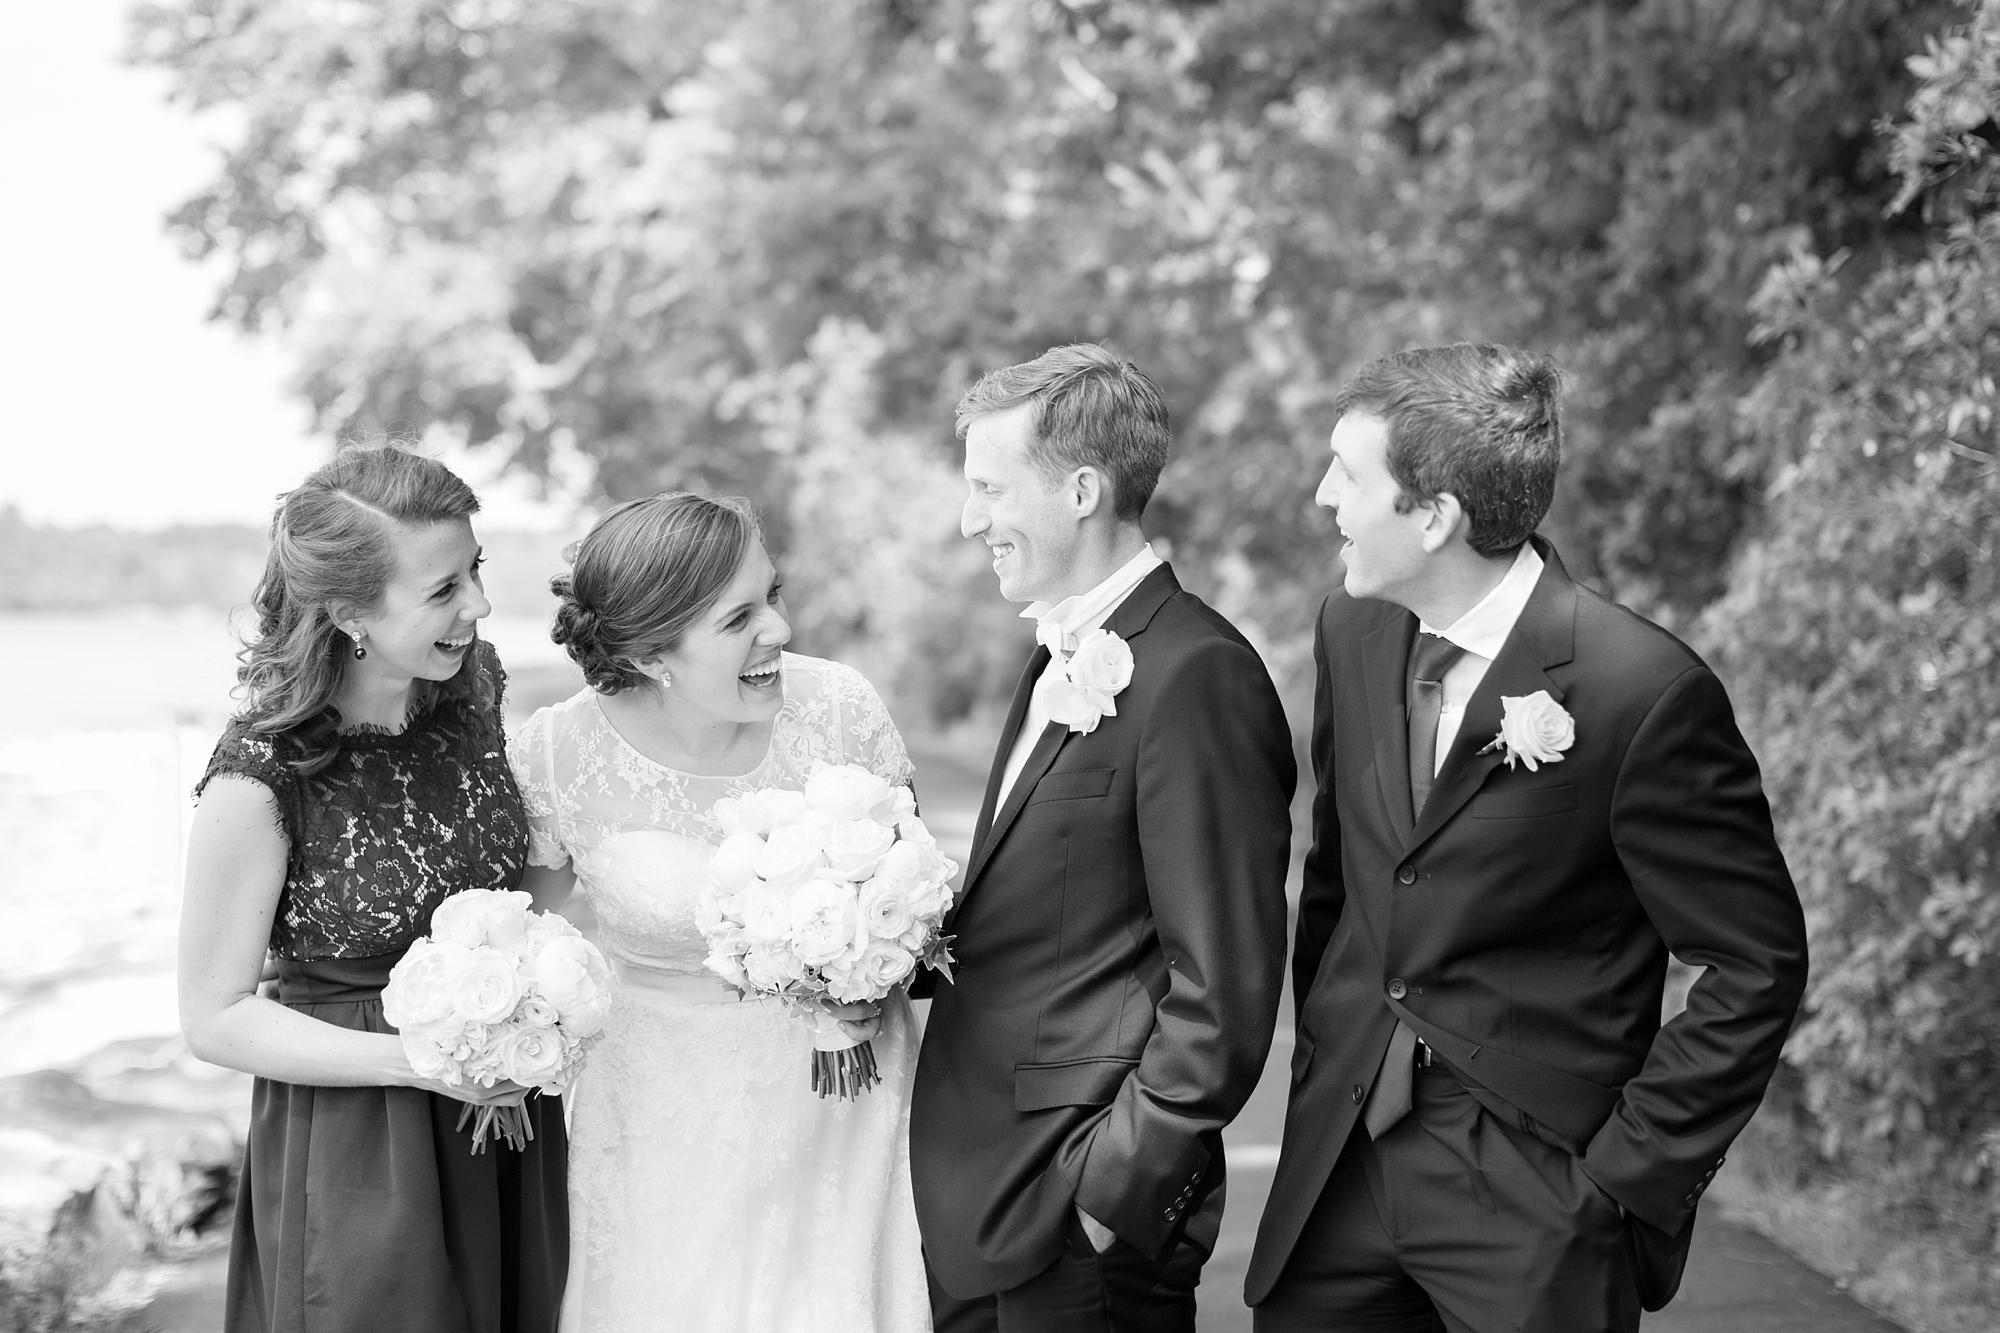 Somerville 5-Bridal Party-1049_anna grace photography sherwood forest annapolis maryland wedding photographer photo.jpg